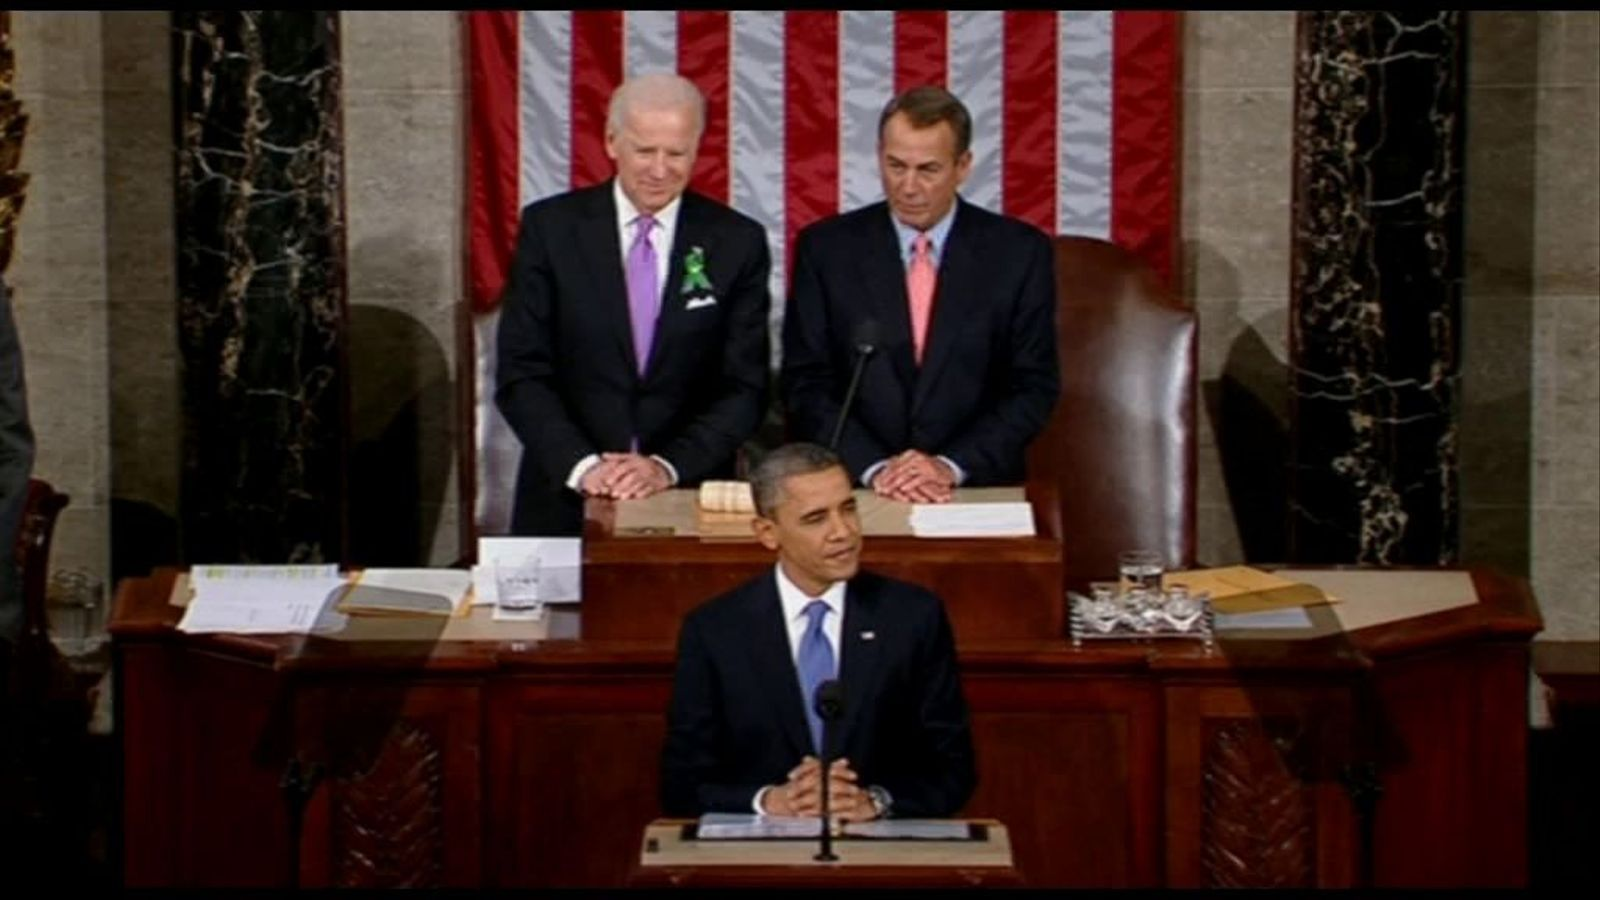 Obama segueix apostant per salvar la classe mitjana